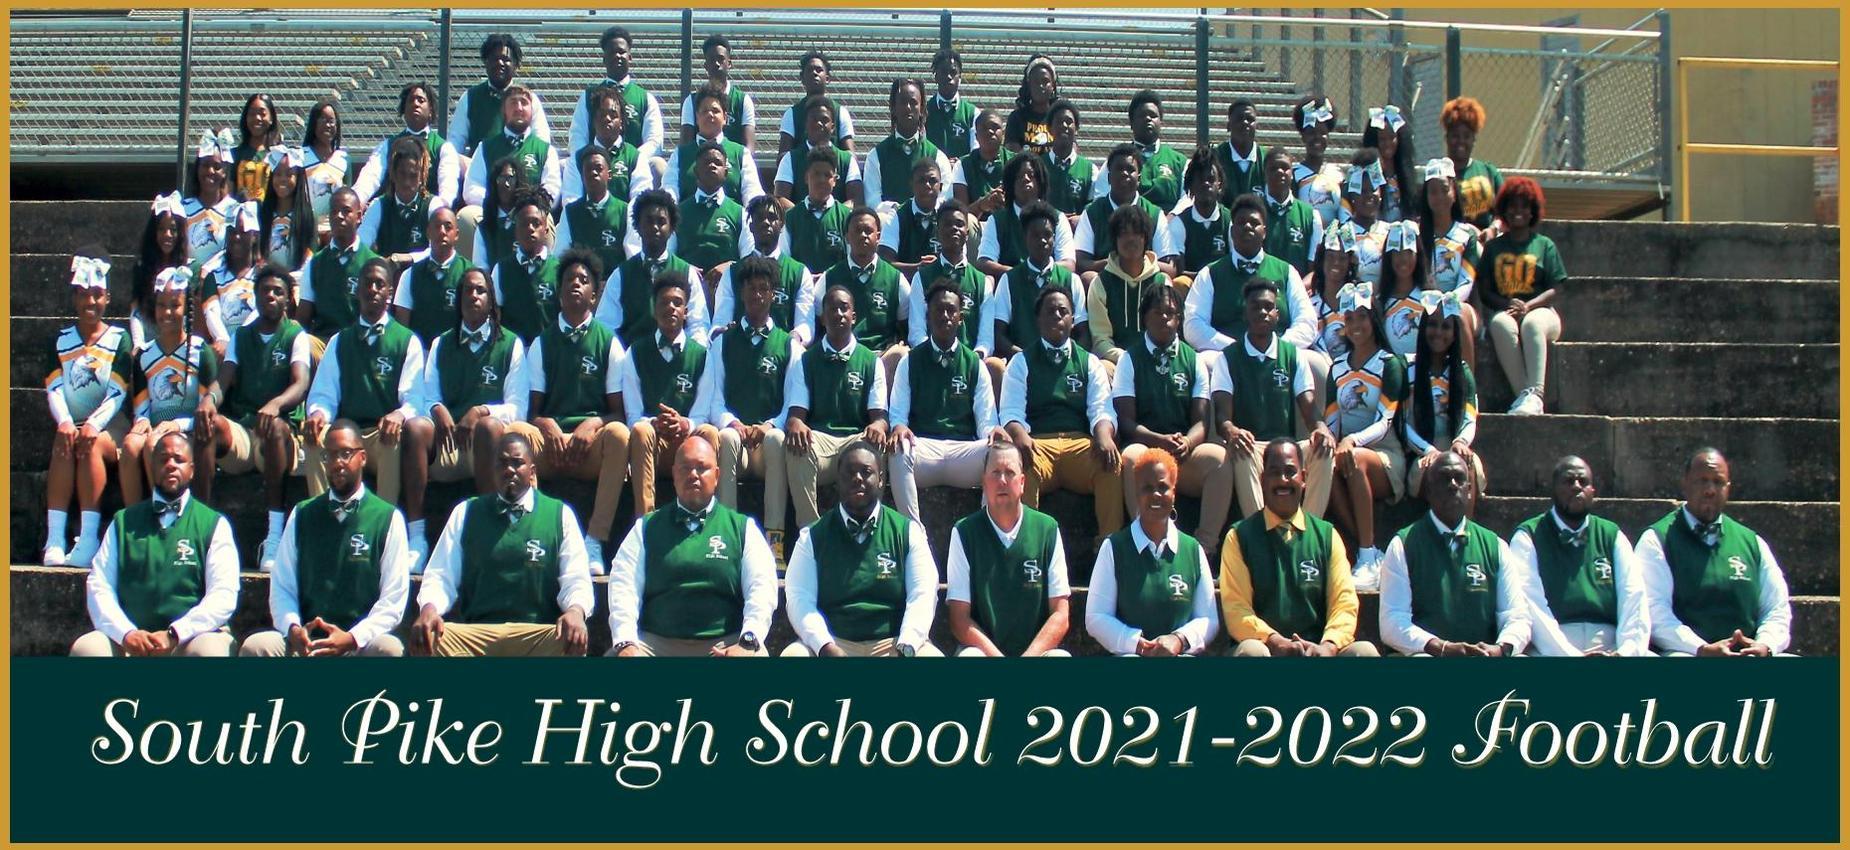 South Pike High School Football